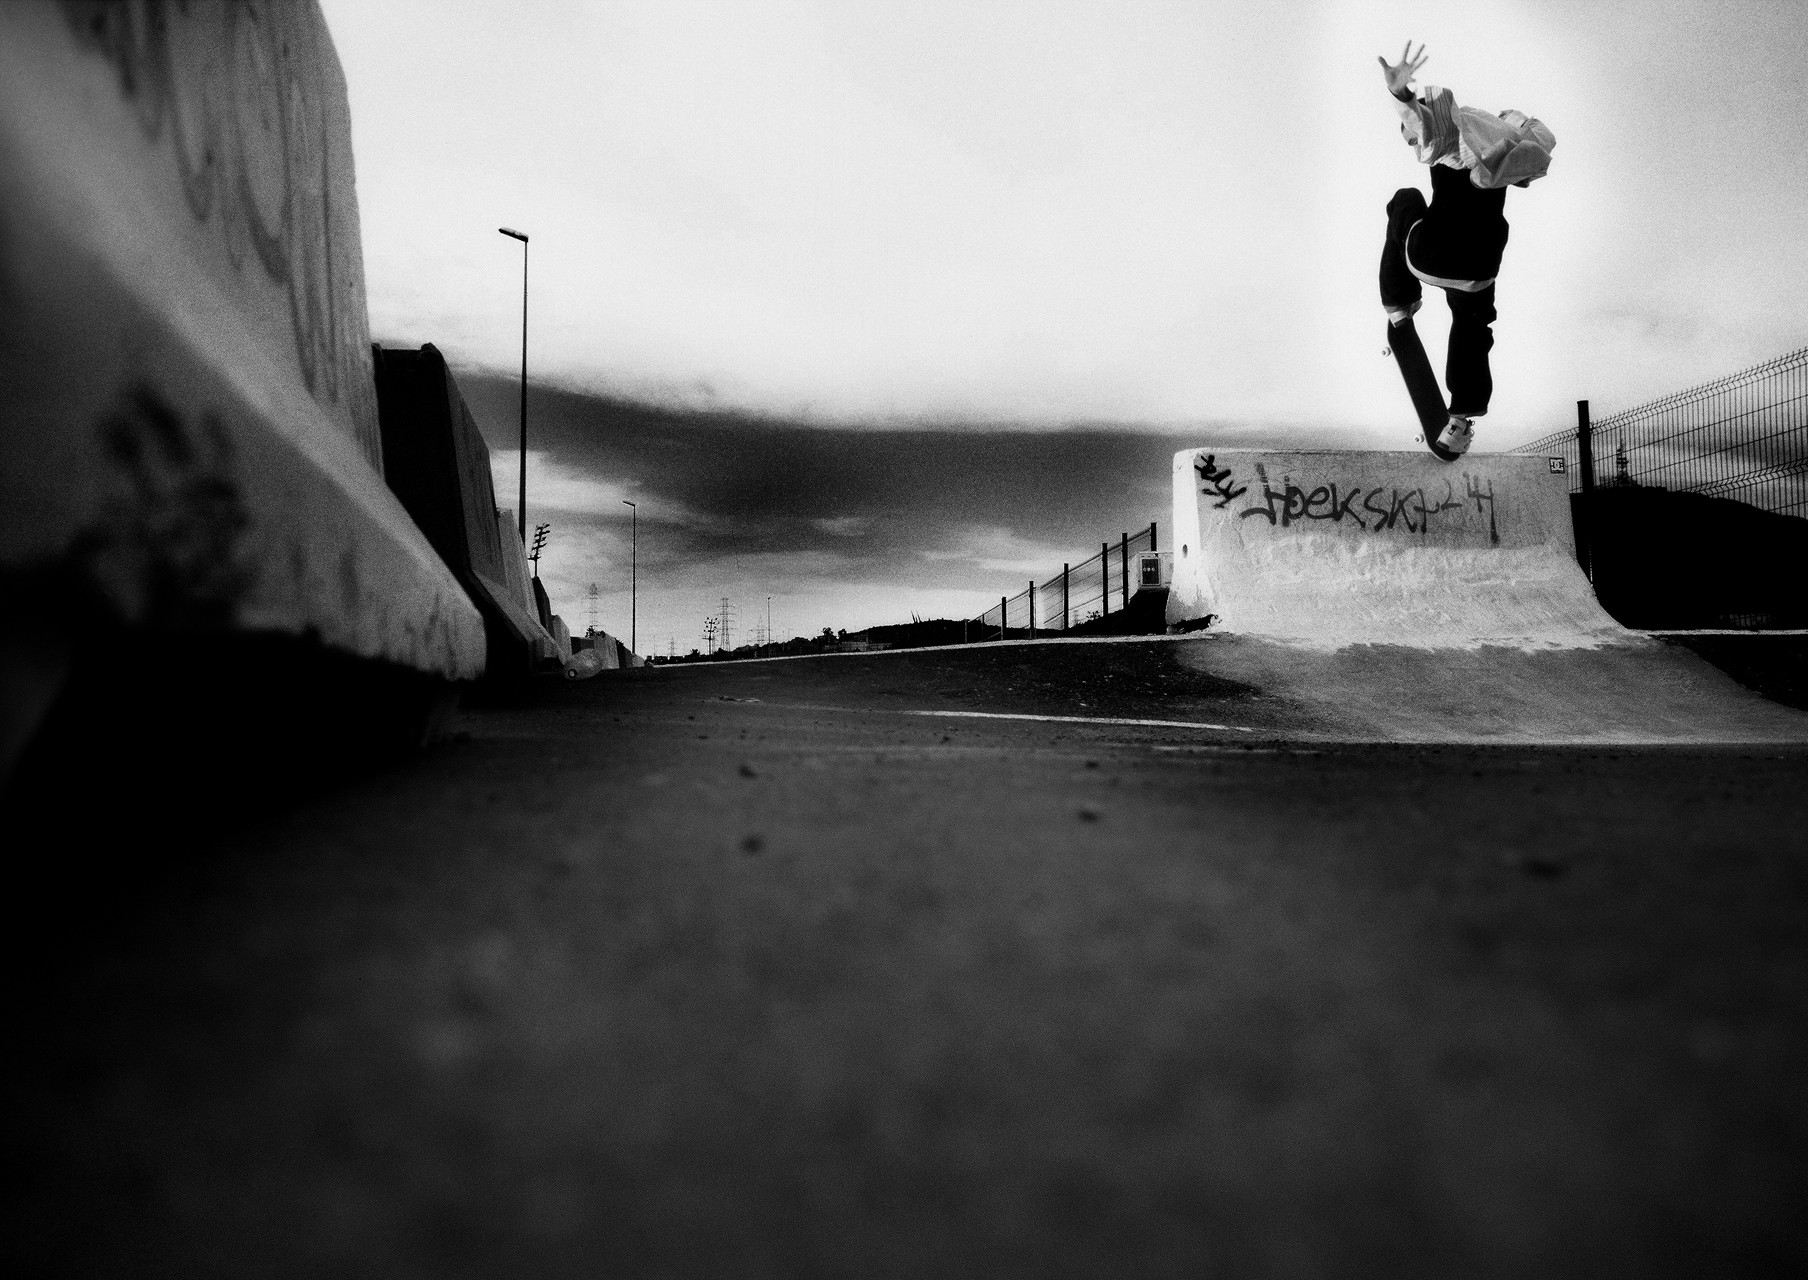 SKATE-STREET-PHOTOGRAPHY-33-JUANMI-MARQUEZ-1761x1280-1761x1280